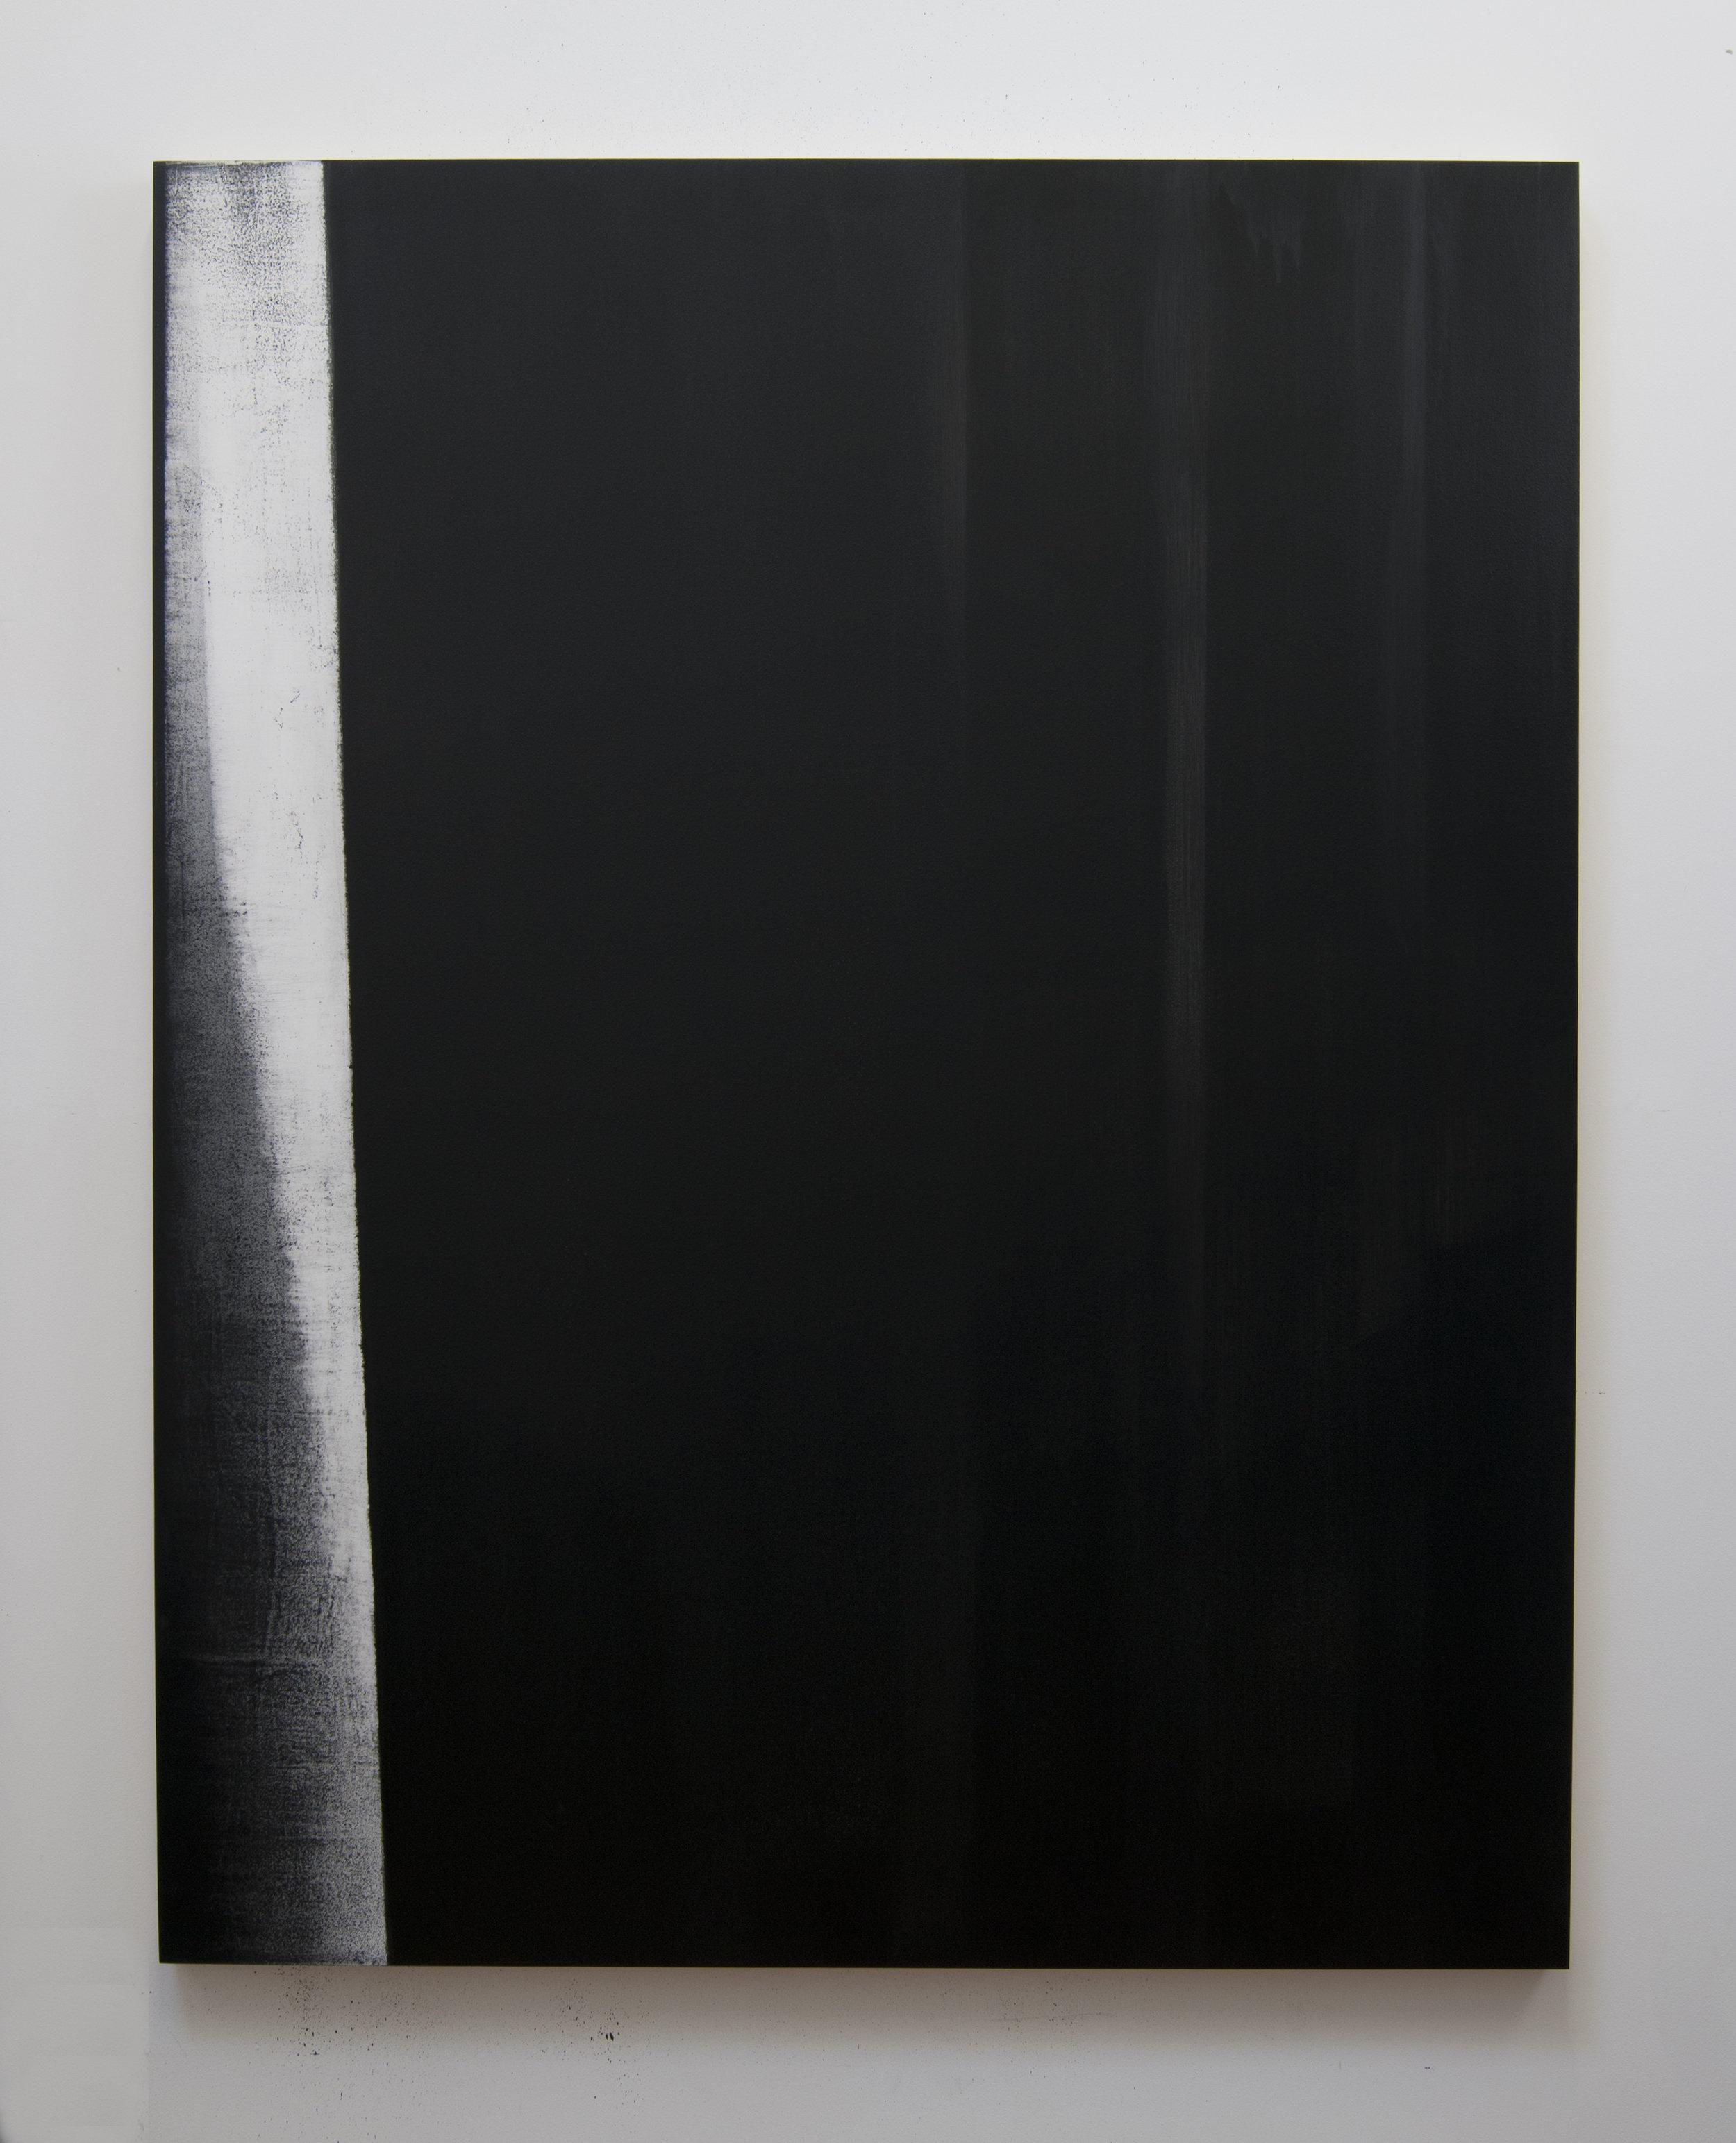 Fugitive VII, 2012  Acrylic on panel, 56 x 44 inches